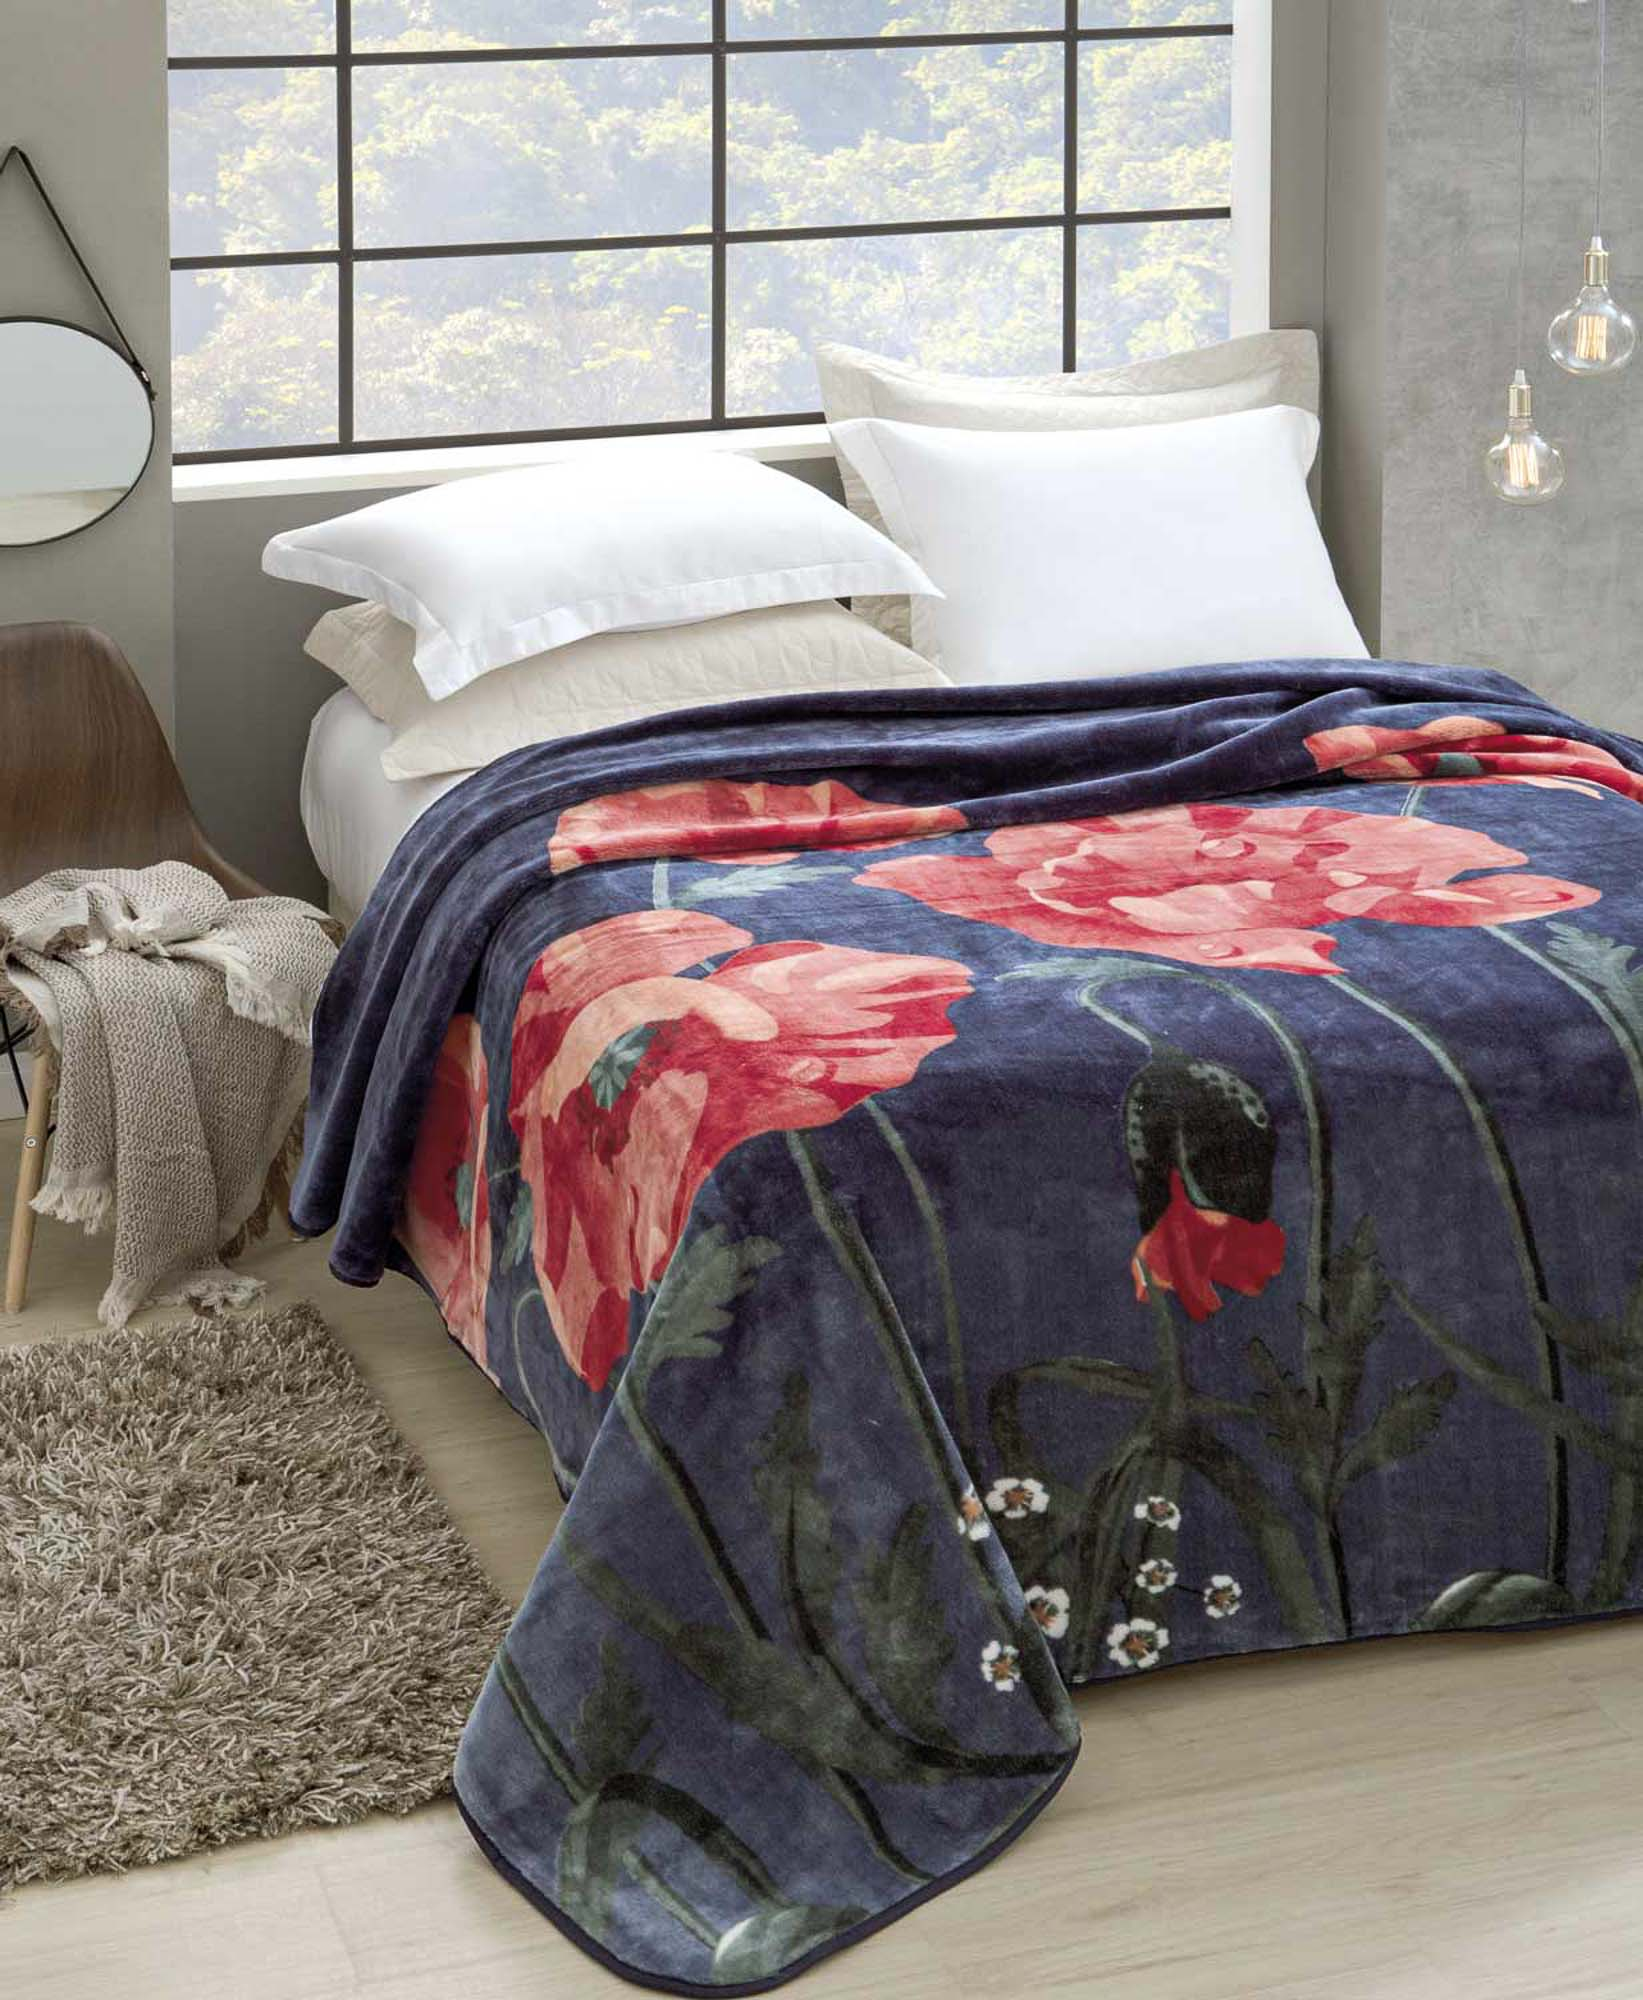 Cobertor Jolitex Raschel King 2,20x2,40m Florescer